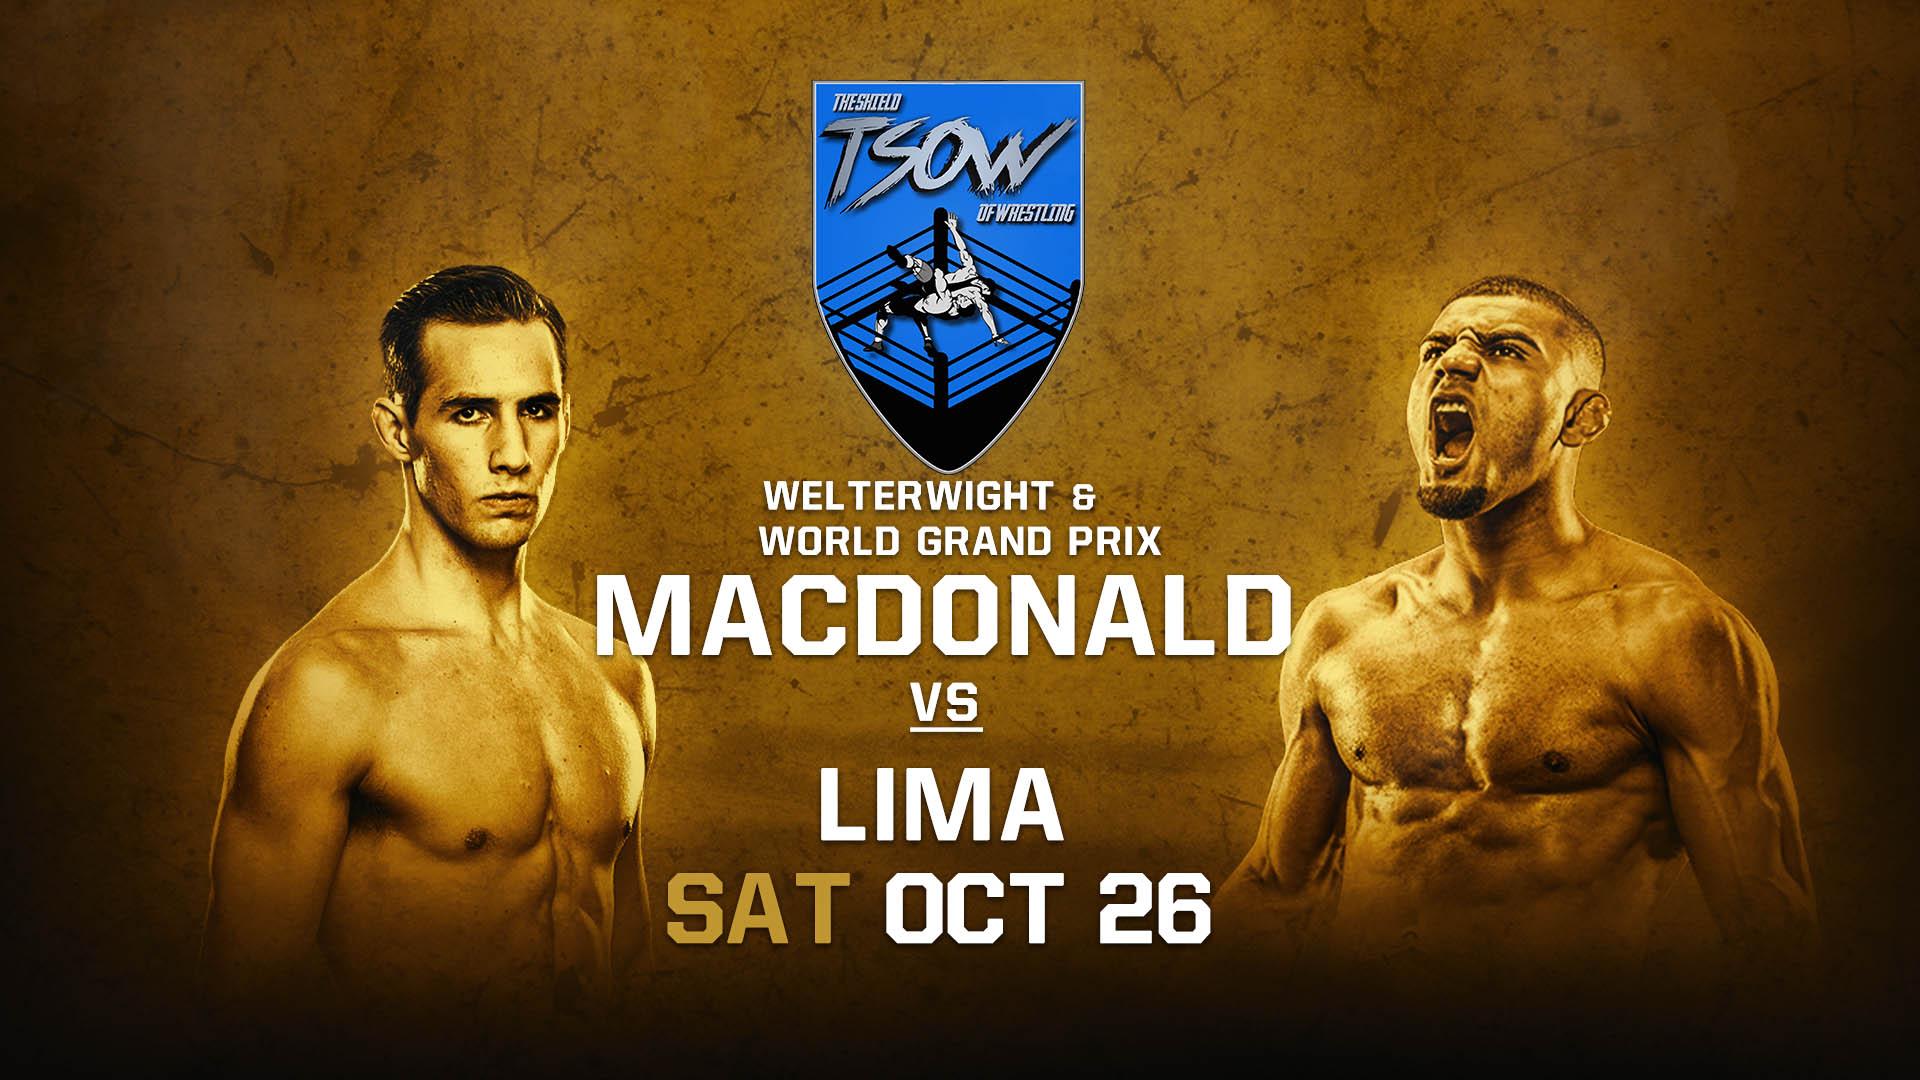 MacDonald vs Lima